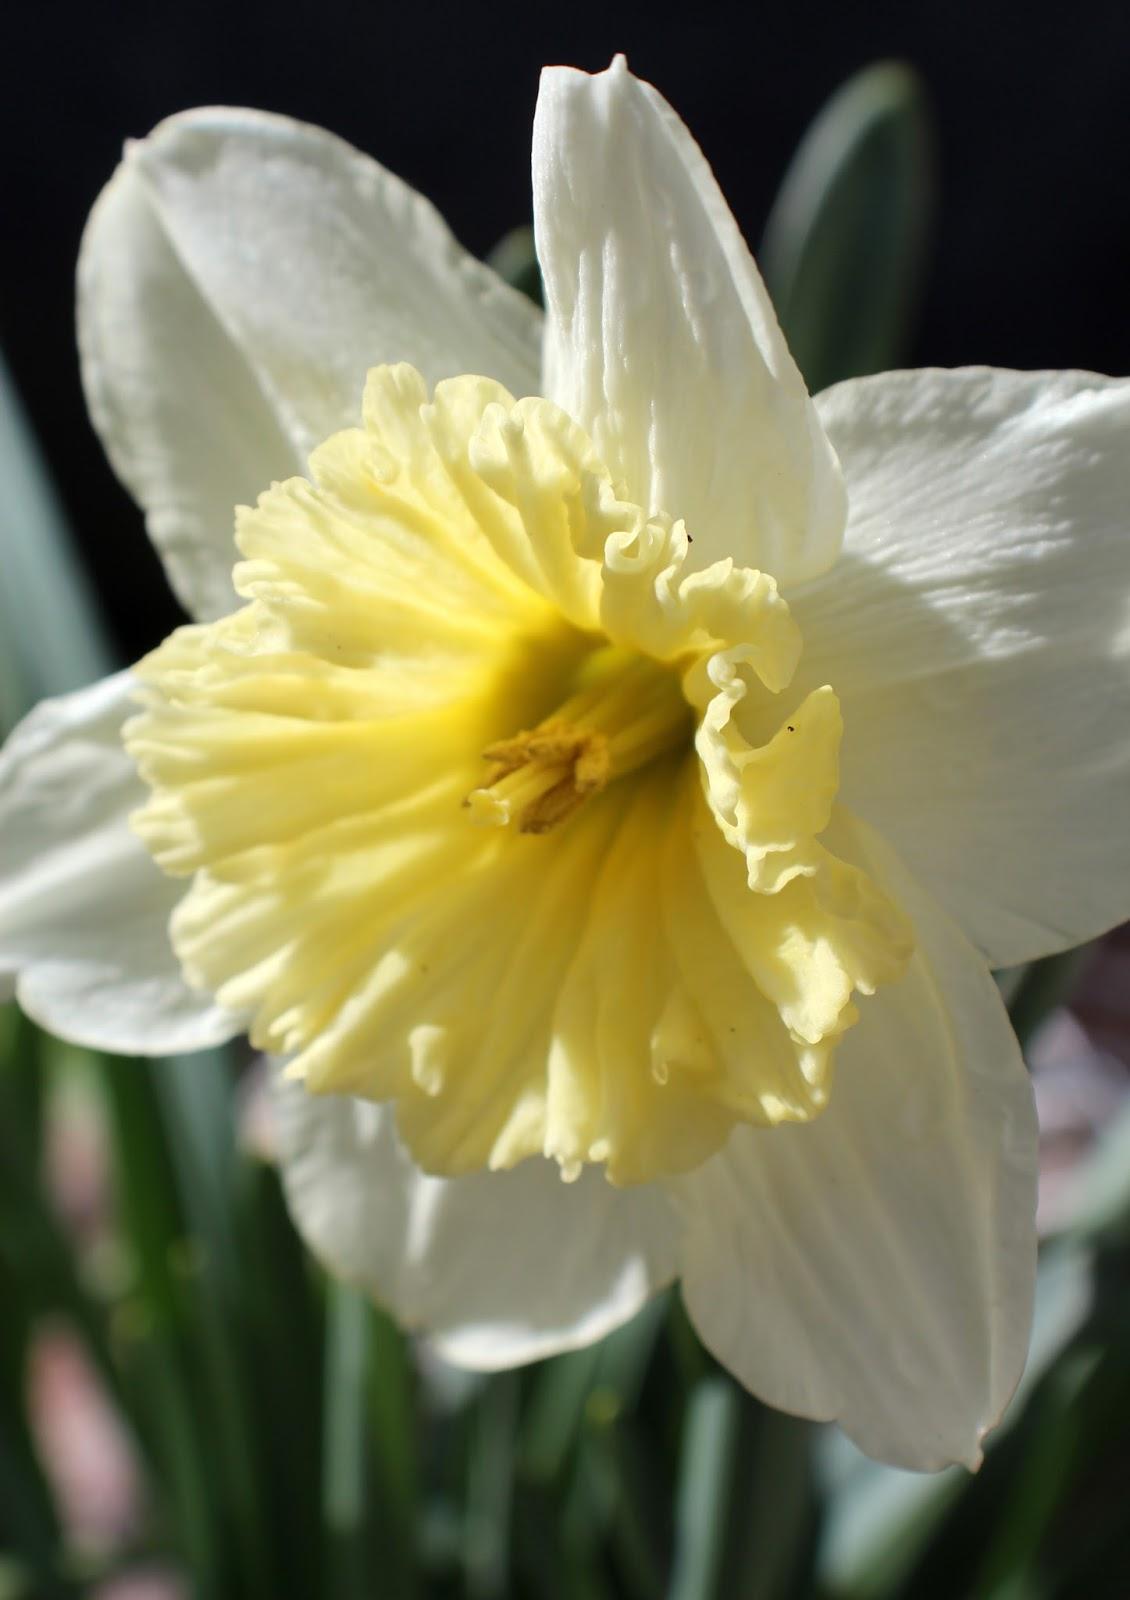 vit gul blomma